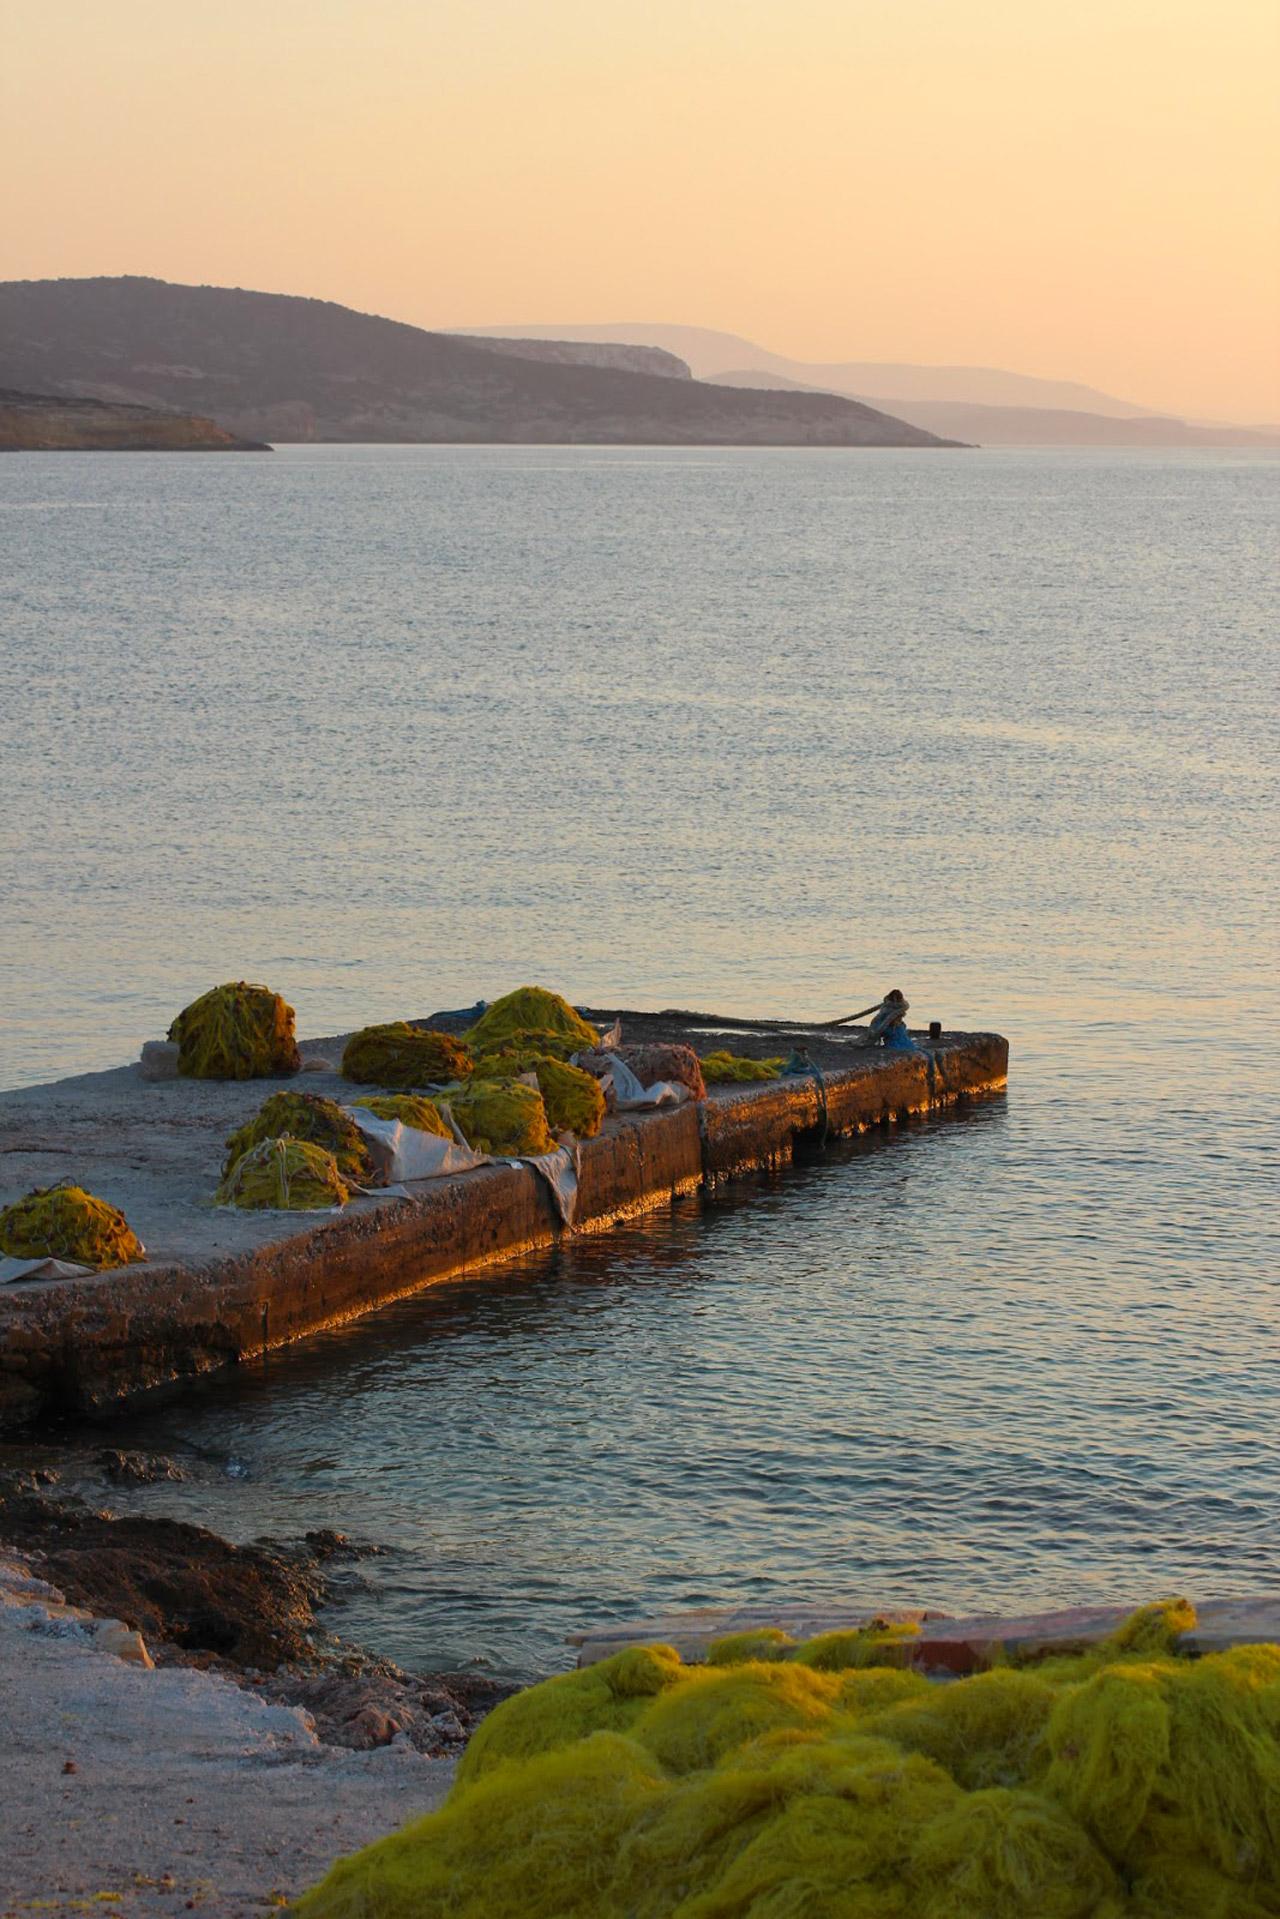 Cyclades-Catamaran-Koufounissia-24